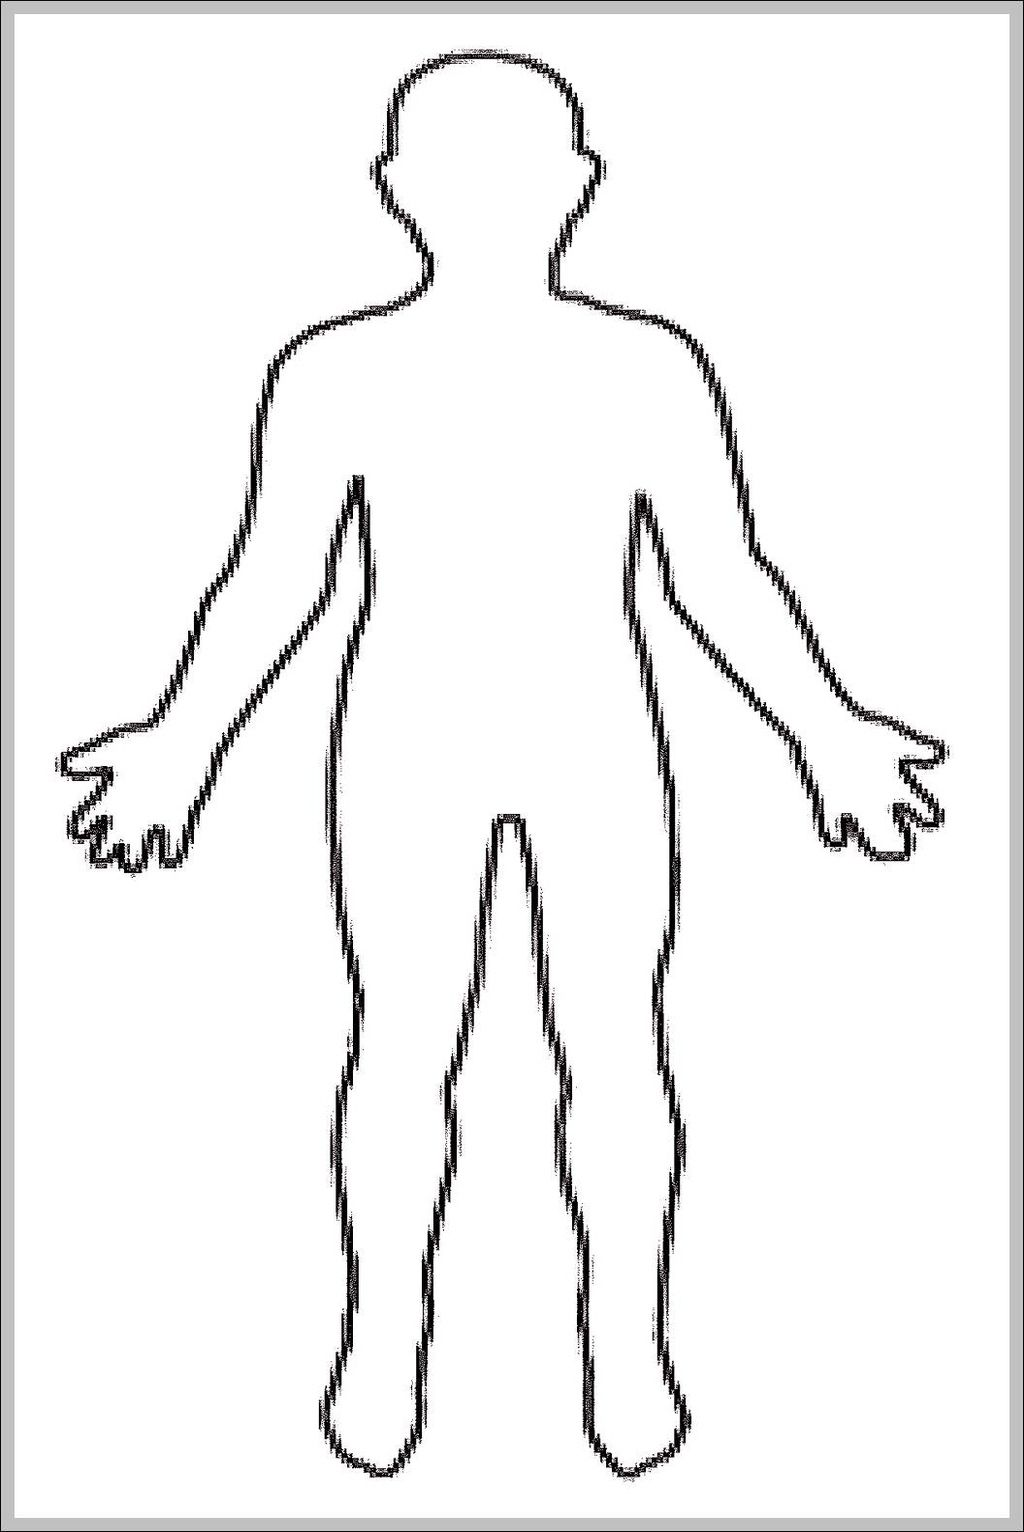 medium resolution of body diagram unlabeled wiring diagram img superior body diagram unlabeled